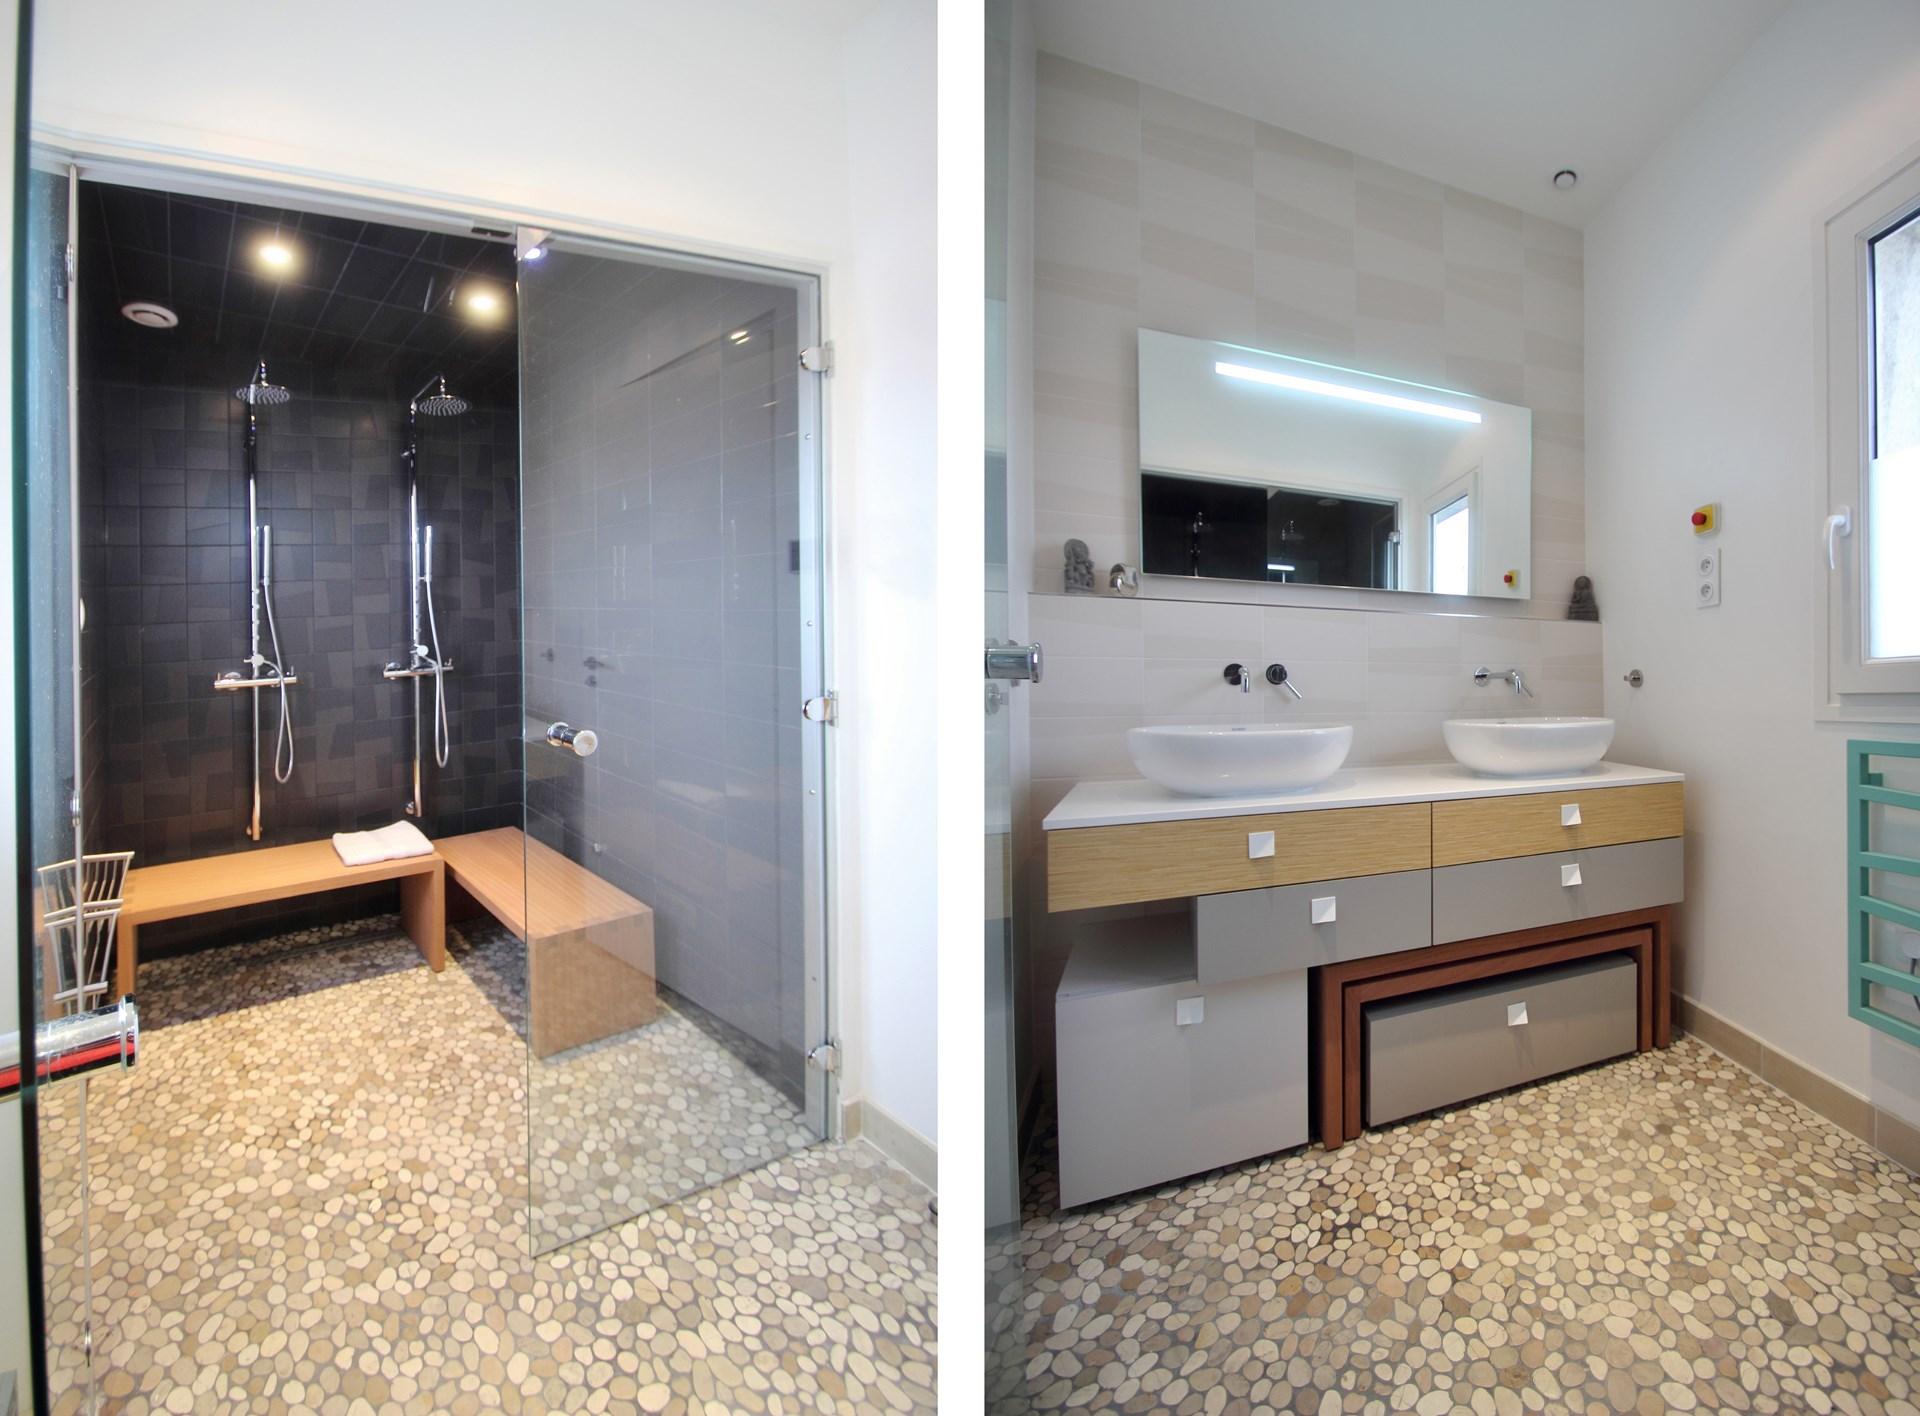 appartement sdb hammam grande douche a l italienne agence avous